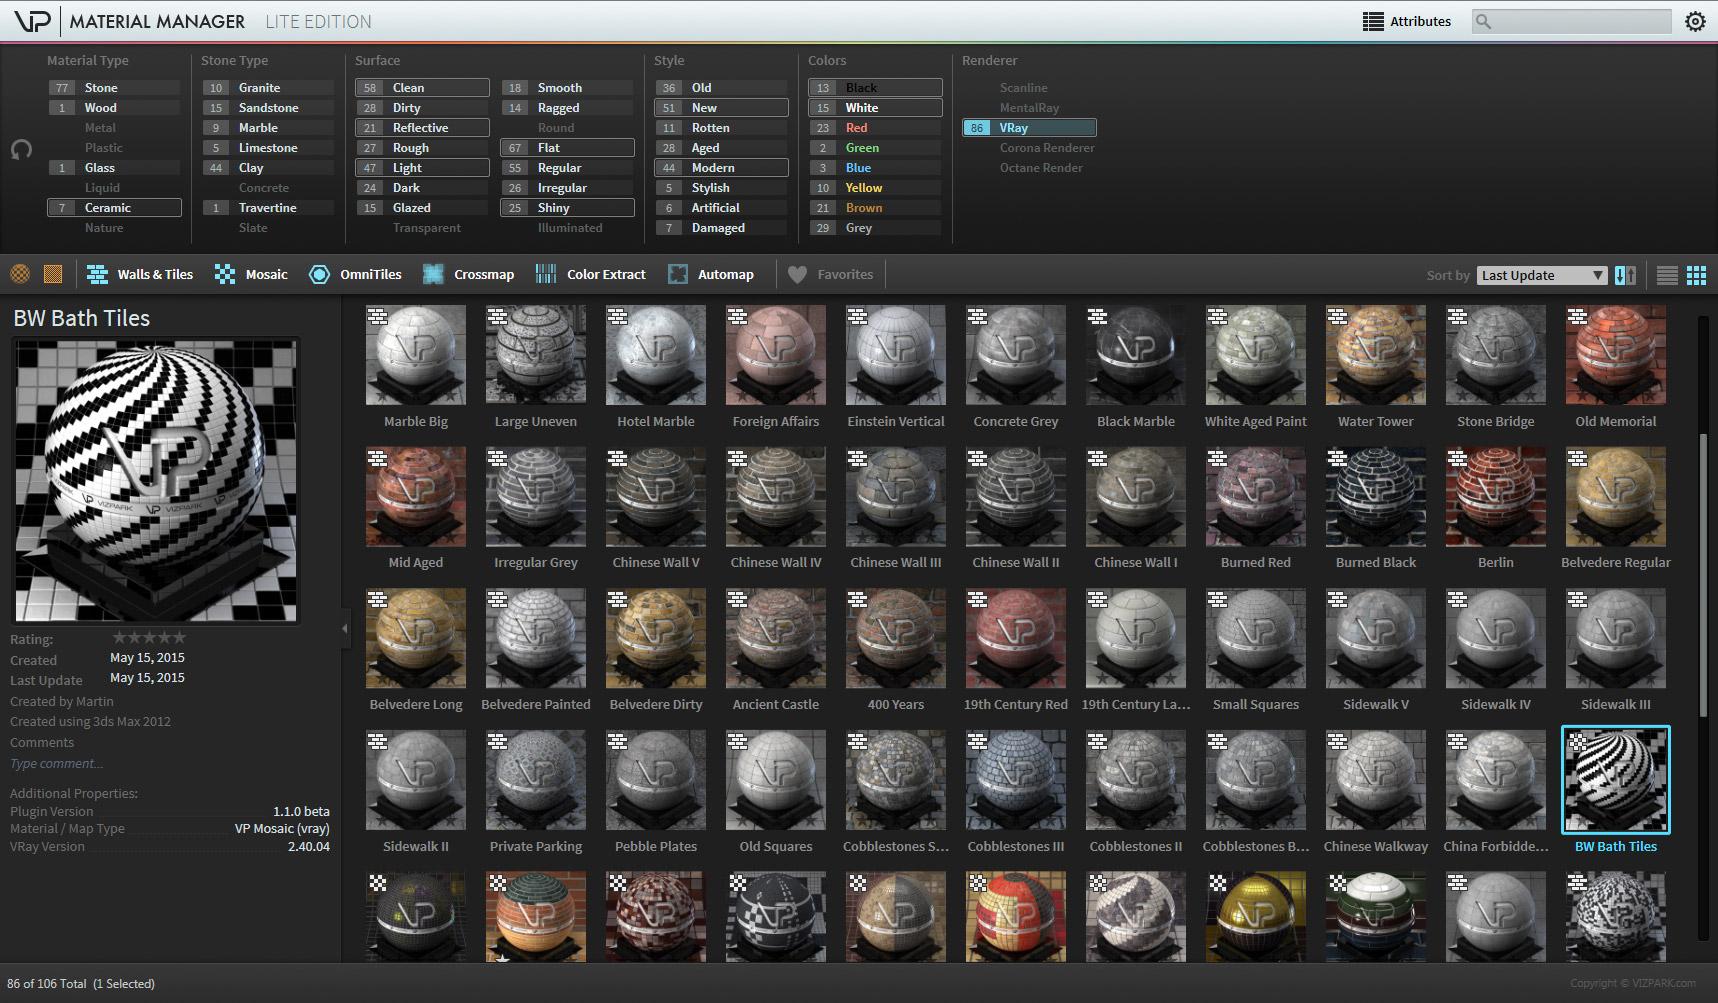 PLUGIN updates for Walls & Tiles, Crossmap, Mosaic - VIZPARK™